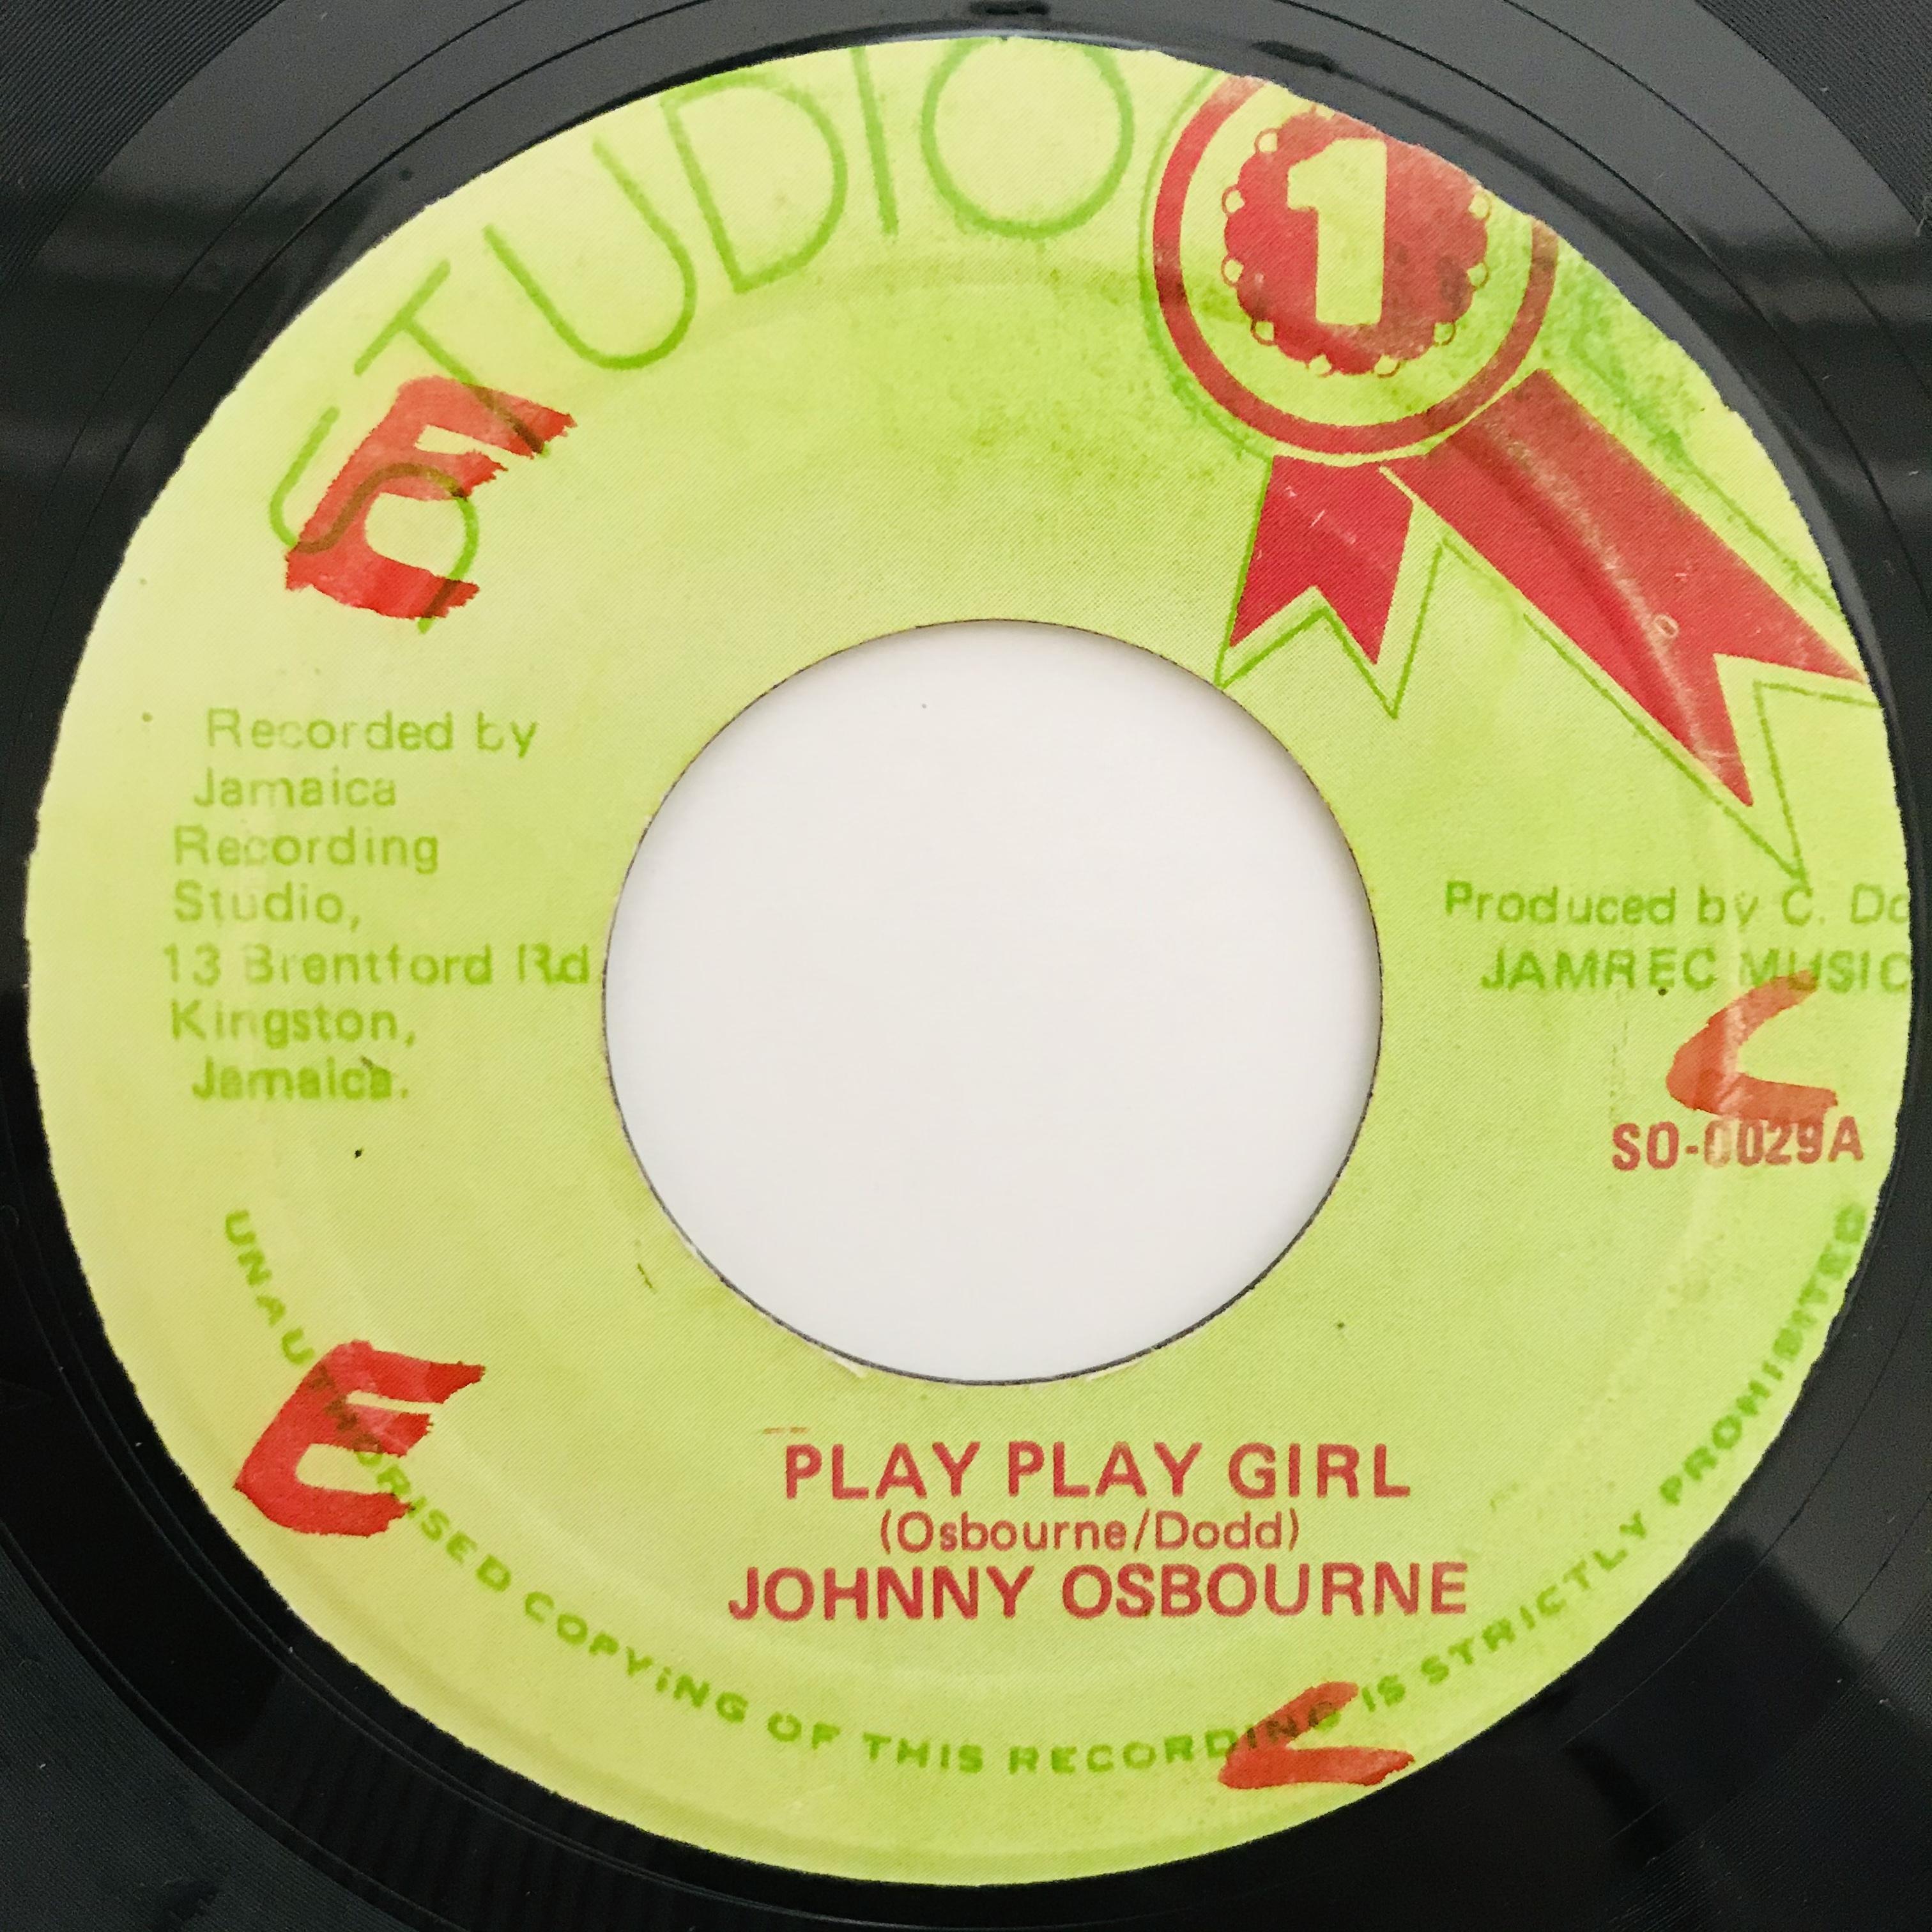 Johnny Osbourne - Play Play Girl 【7-11012】